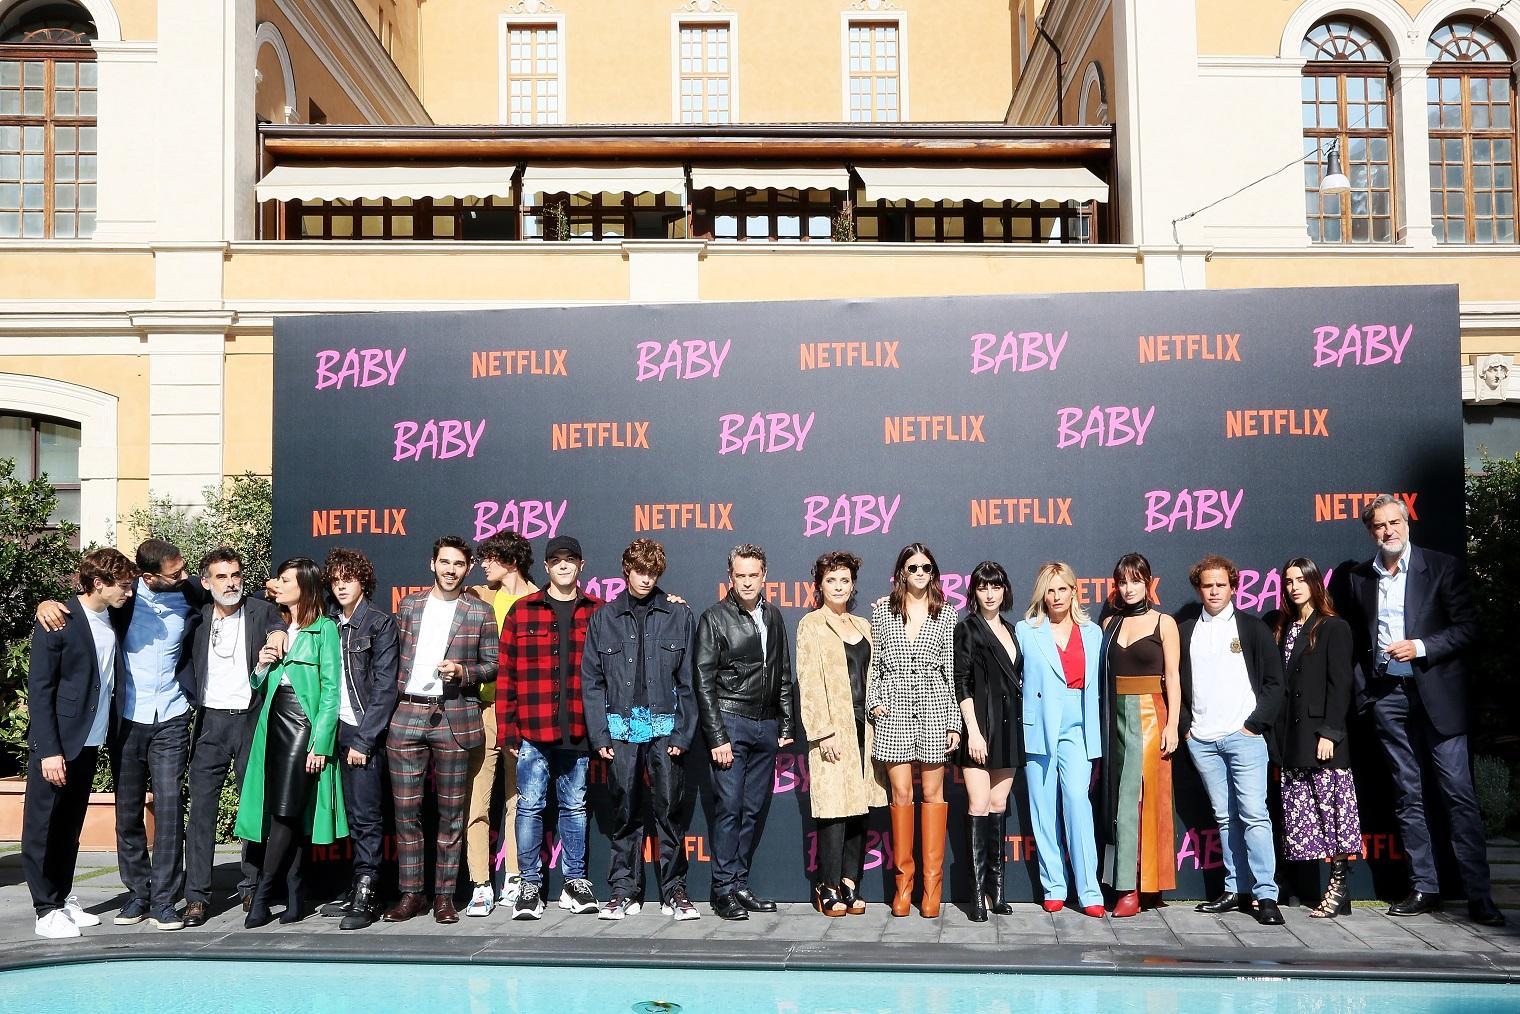 BABY 2 Premiere Denise Capezza attrice netflix natalia getty images red carpet presentazione cast